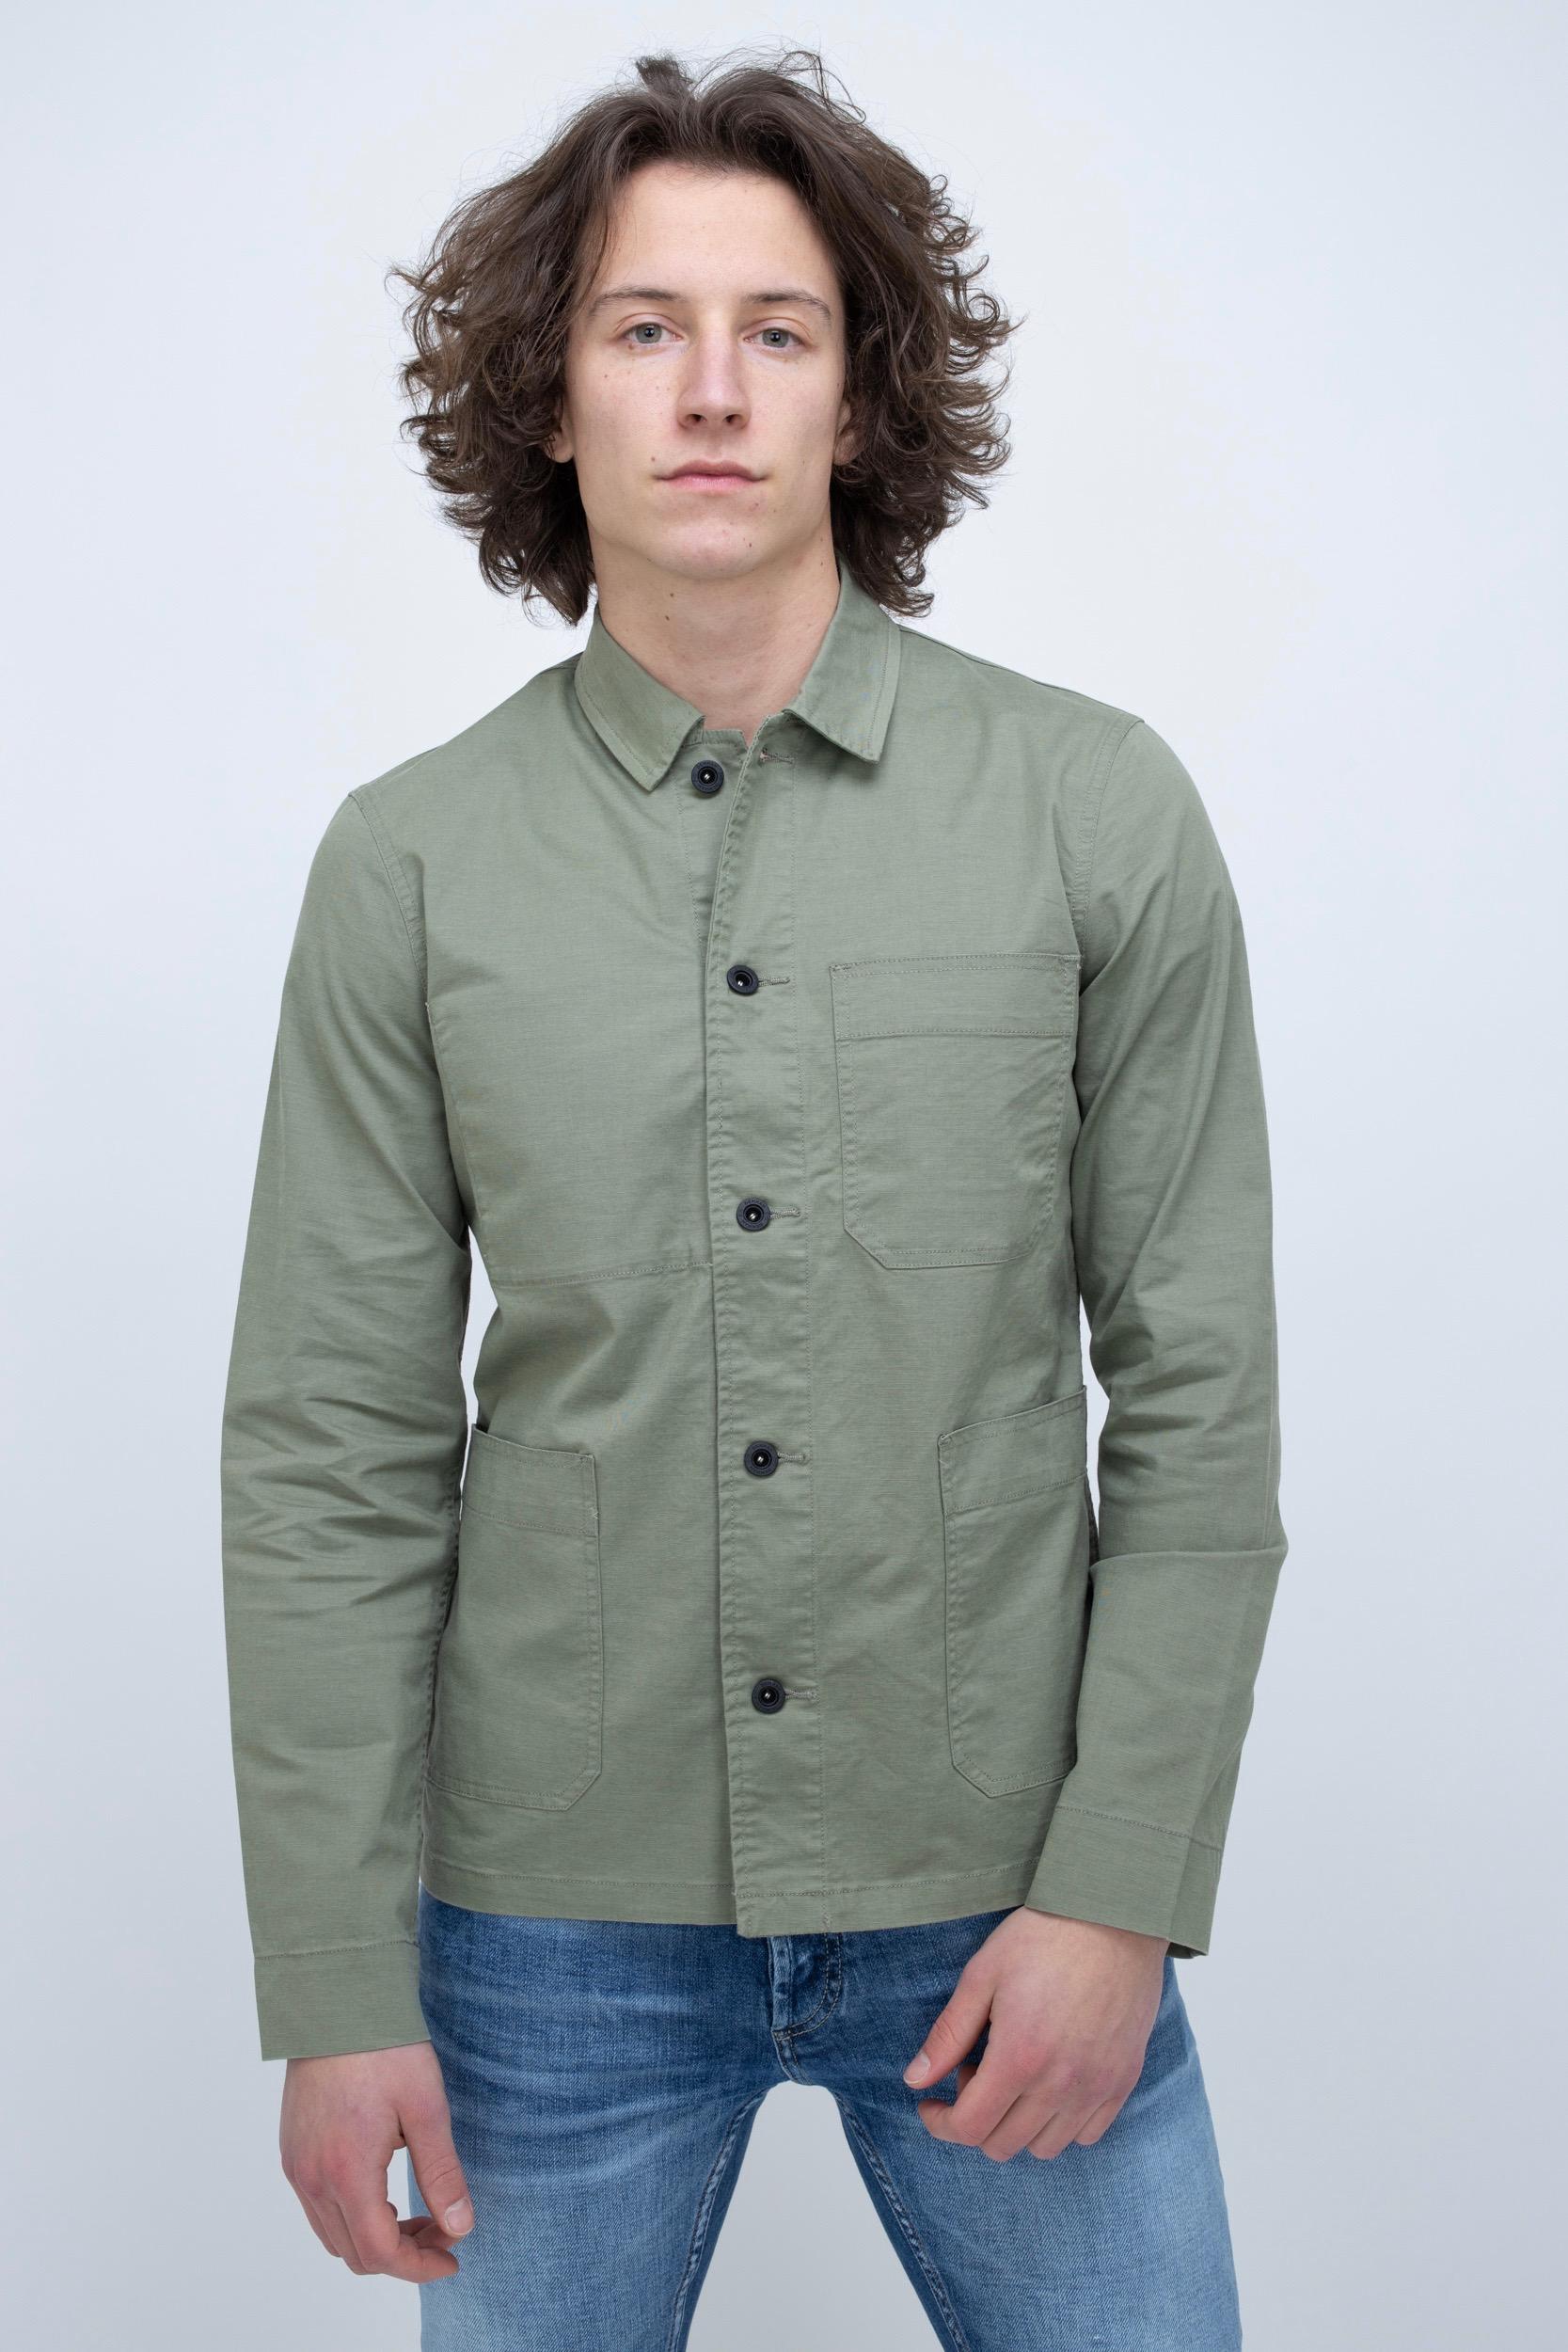 Overshirt Mao